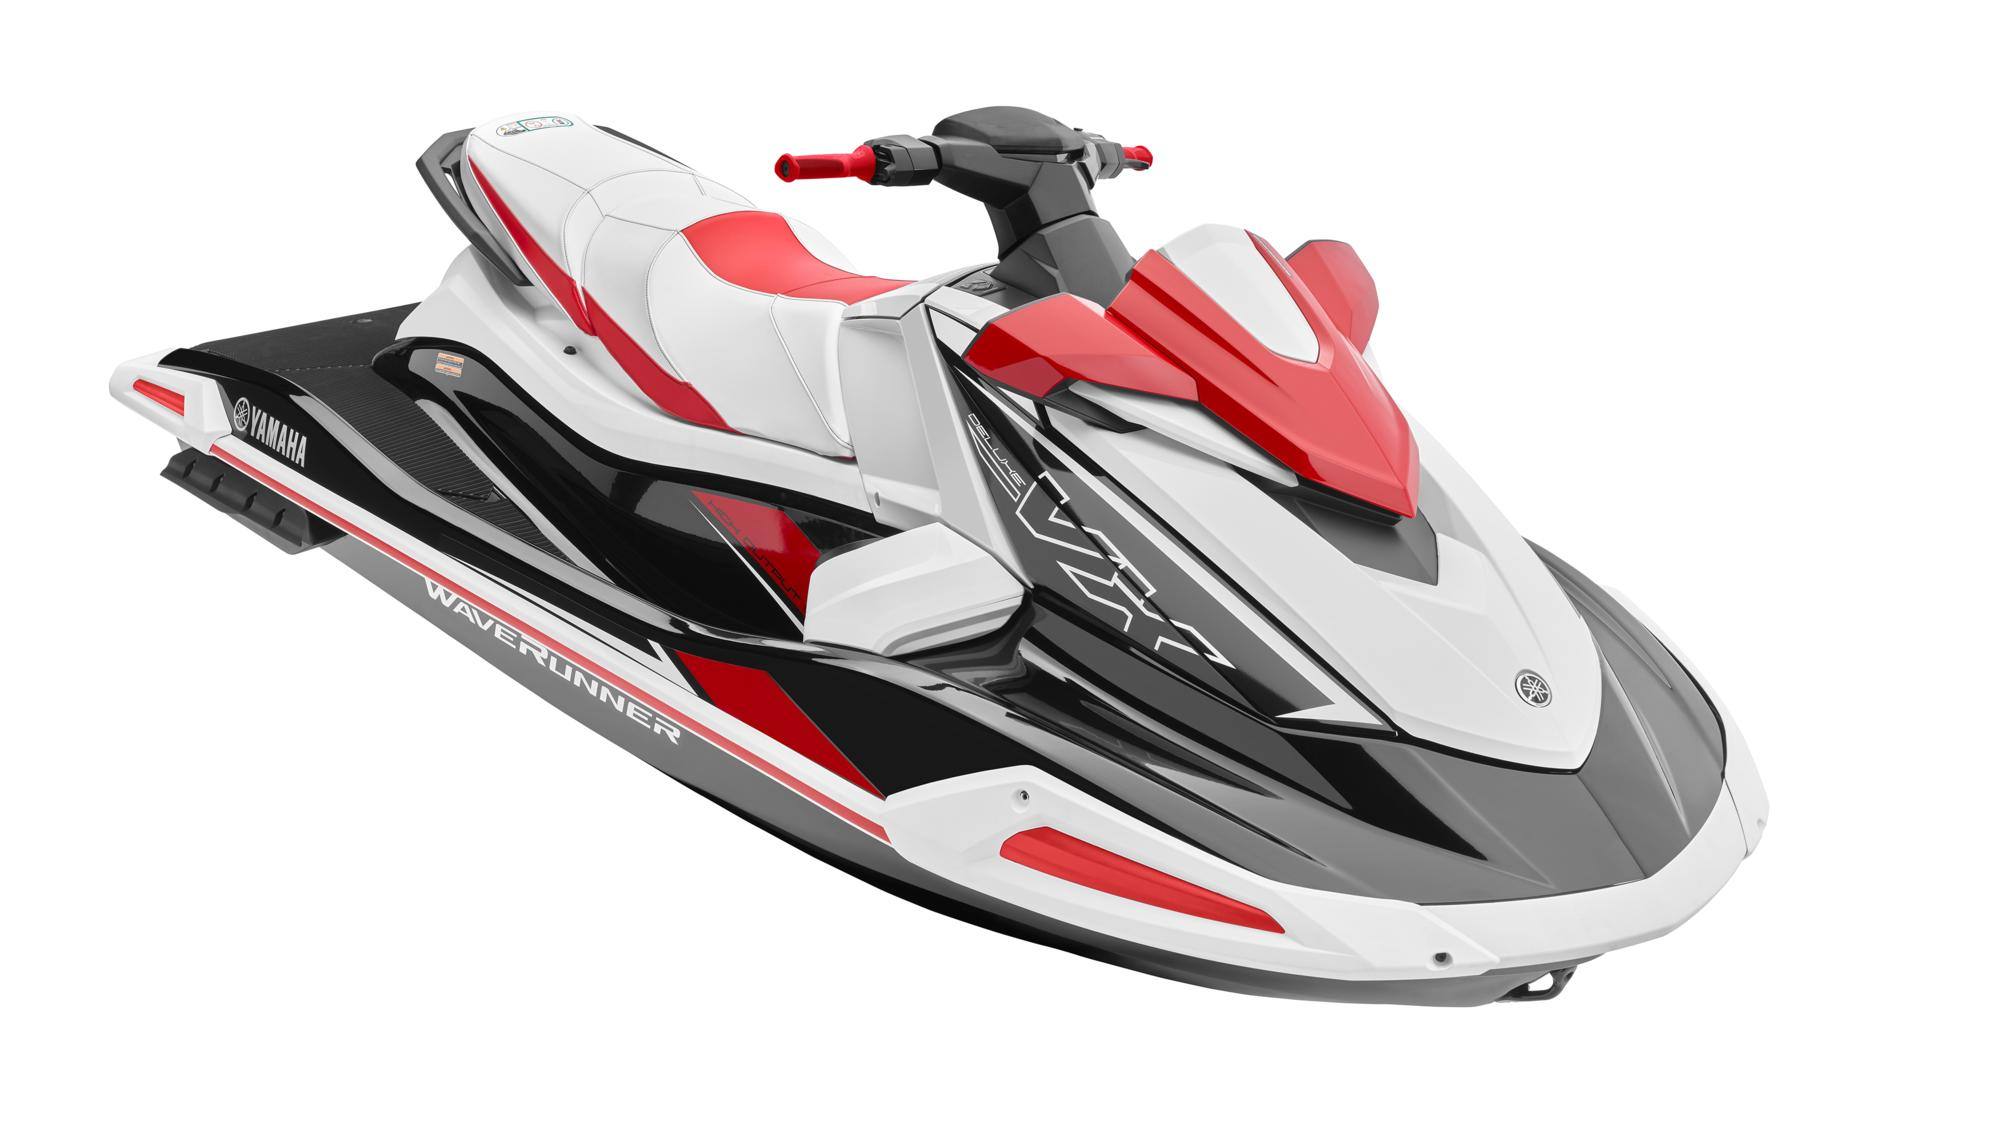 Yamaha VX Deluxe 2021 Image